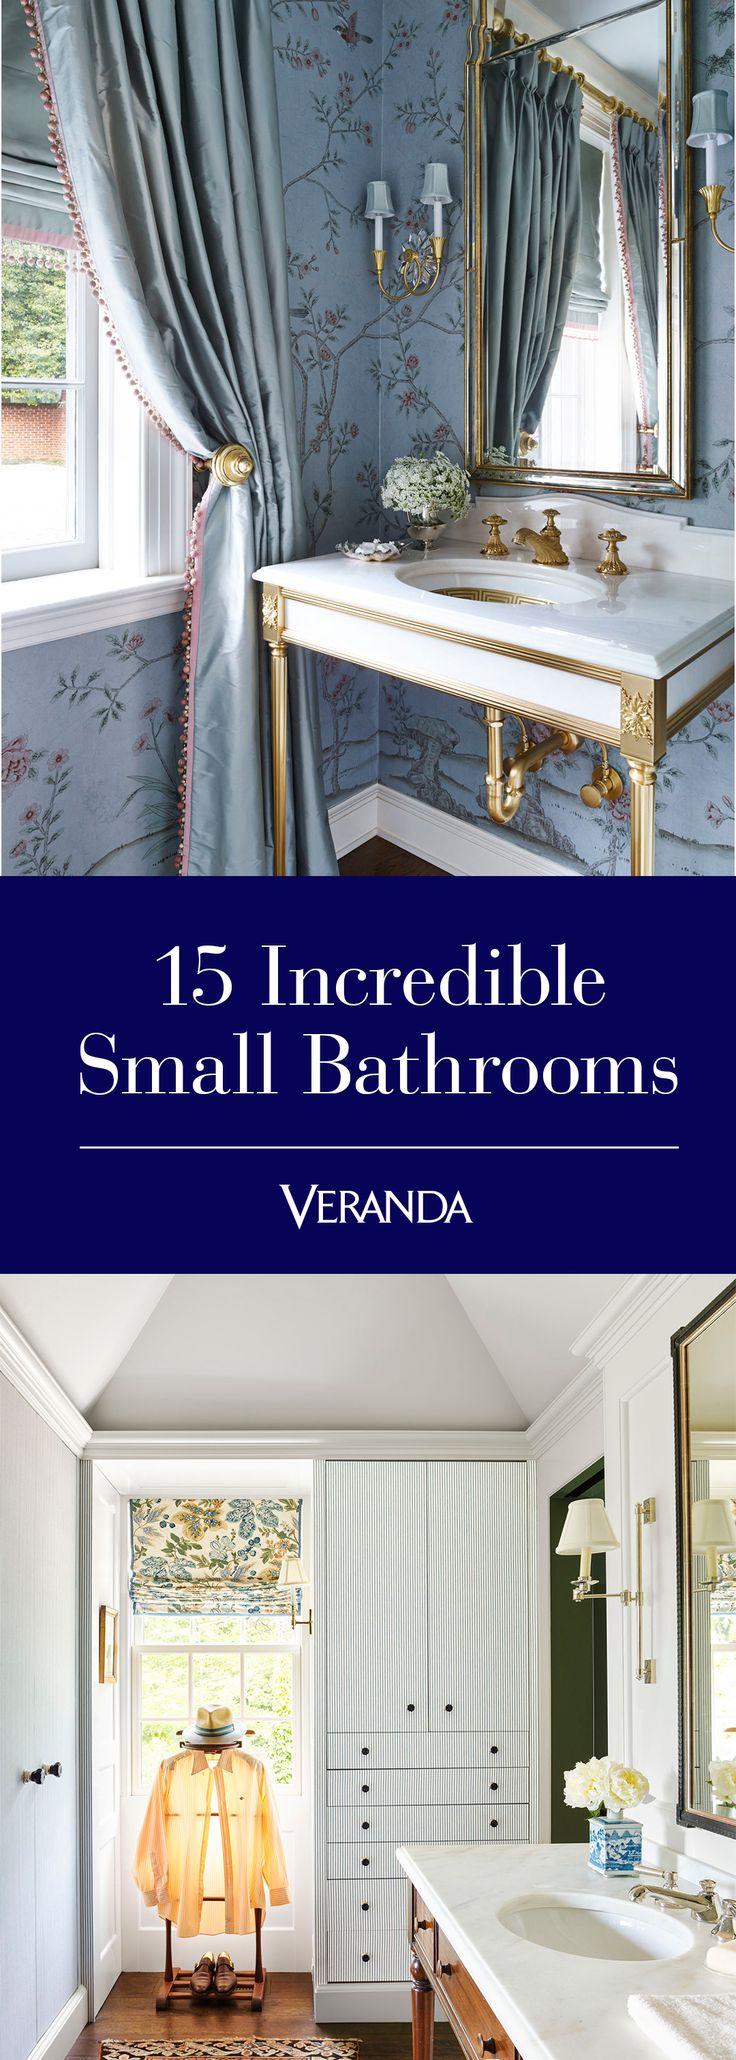 Single Bathroom Vanity Small Spaces